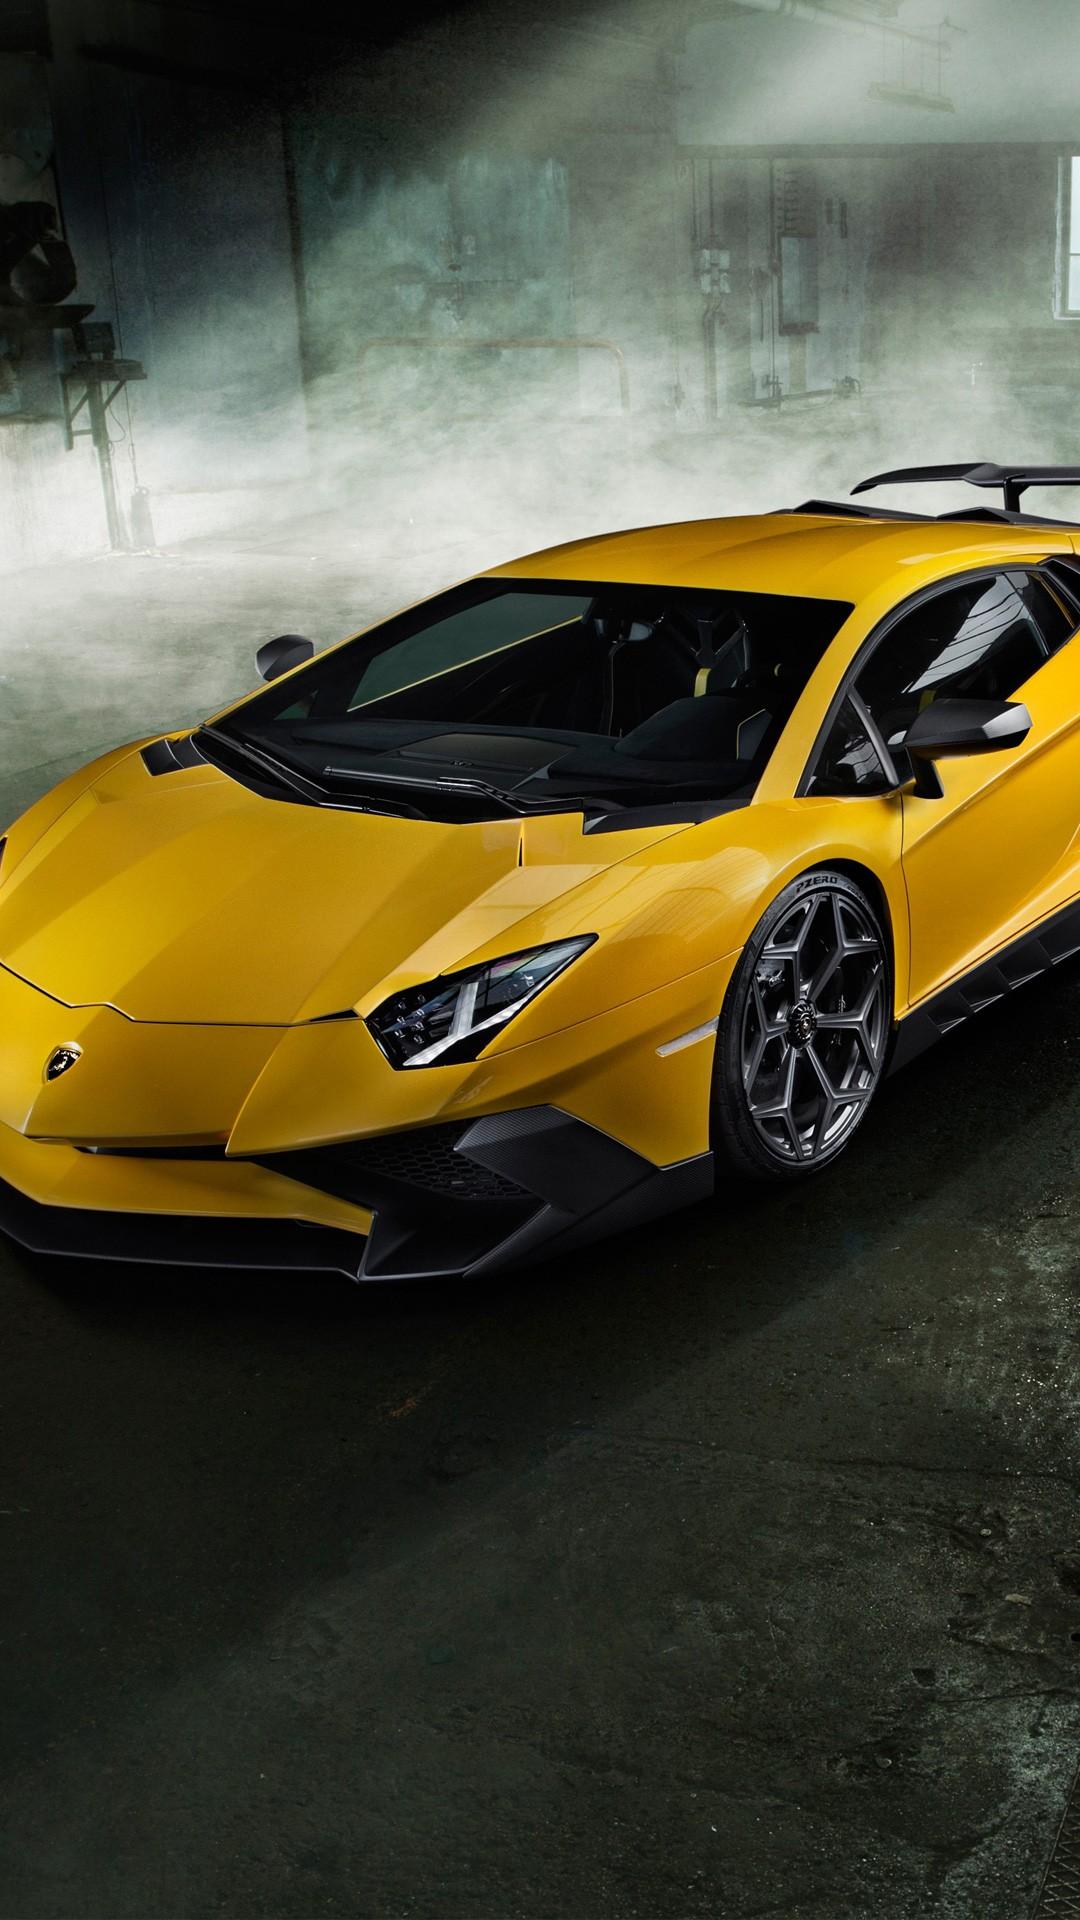 Super Hd Wallpapers Iphone X Lamborghini Aventador Lp 750 4 Superveloce Wallpapers Hd